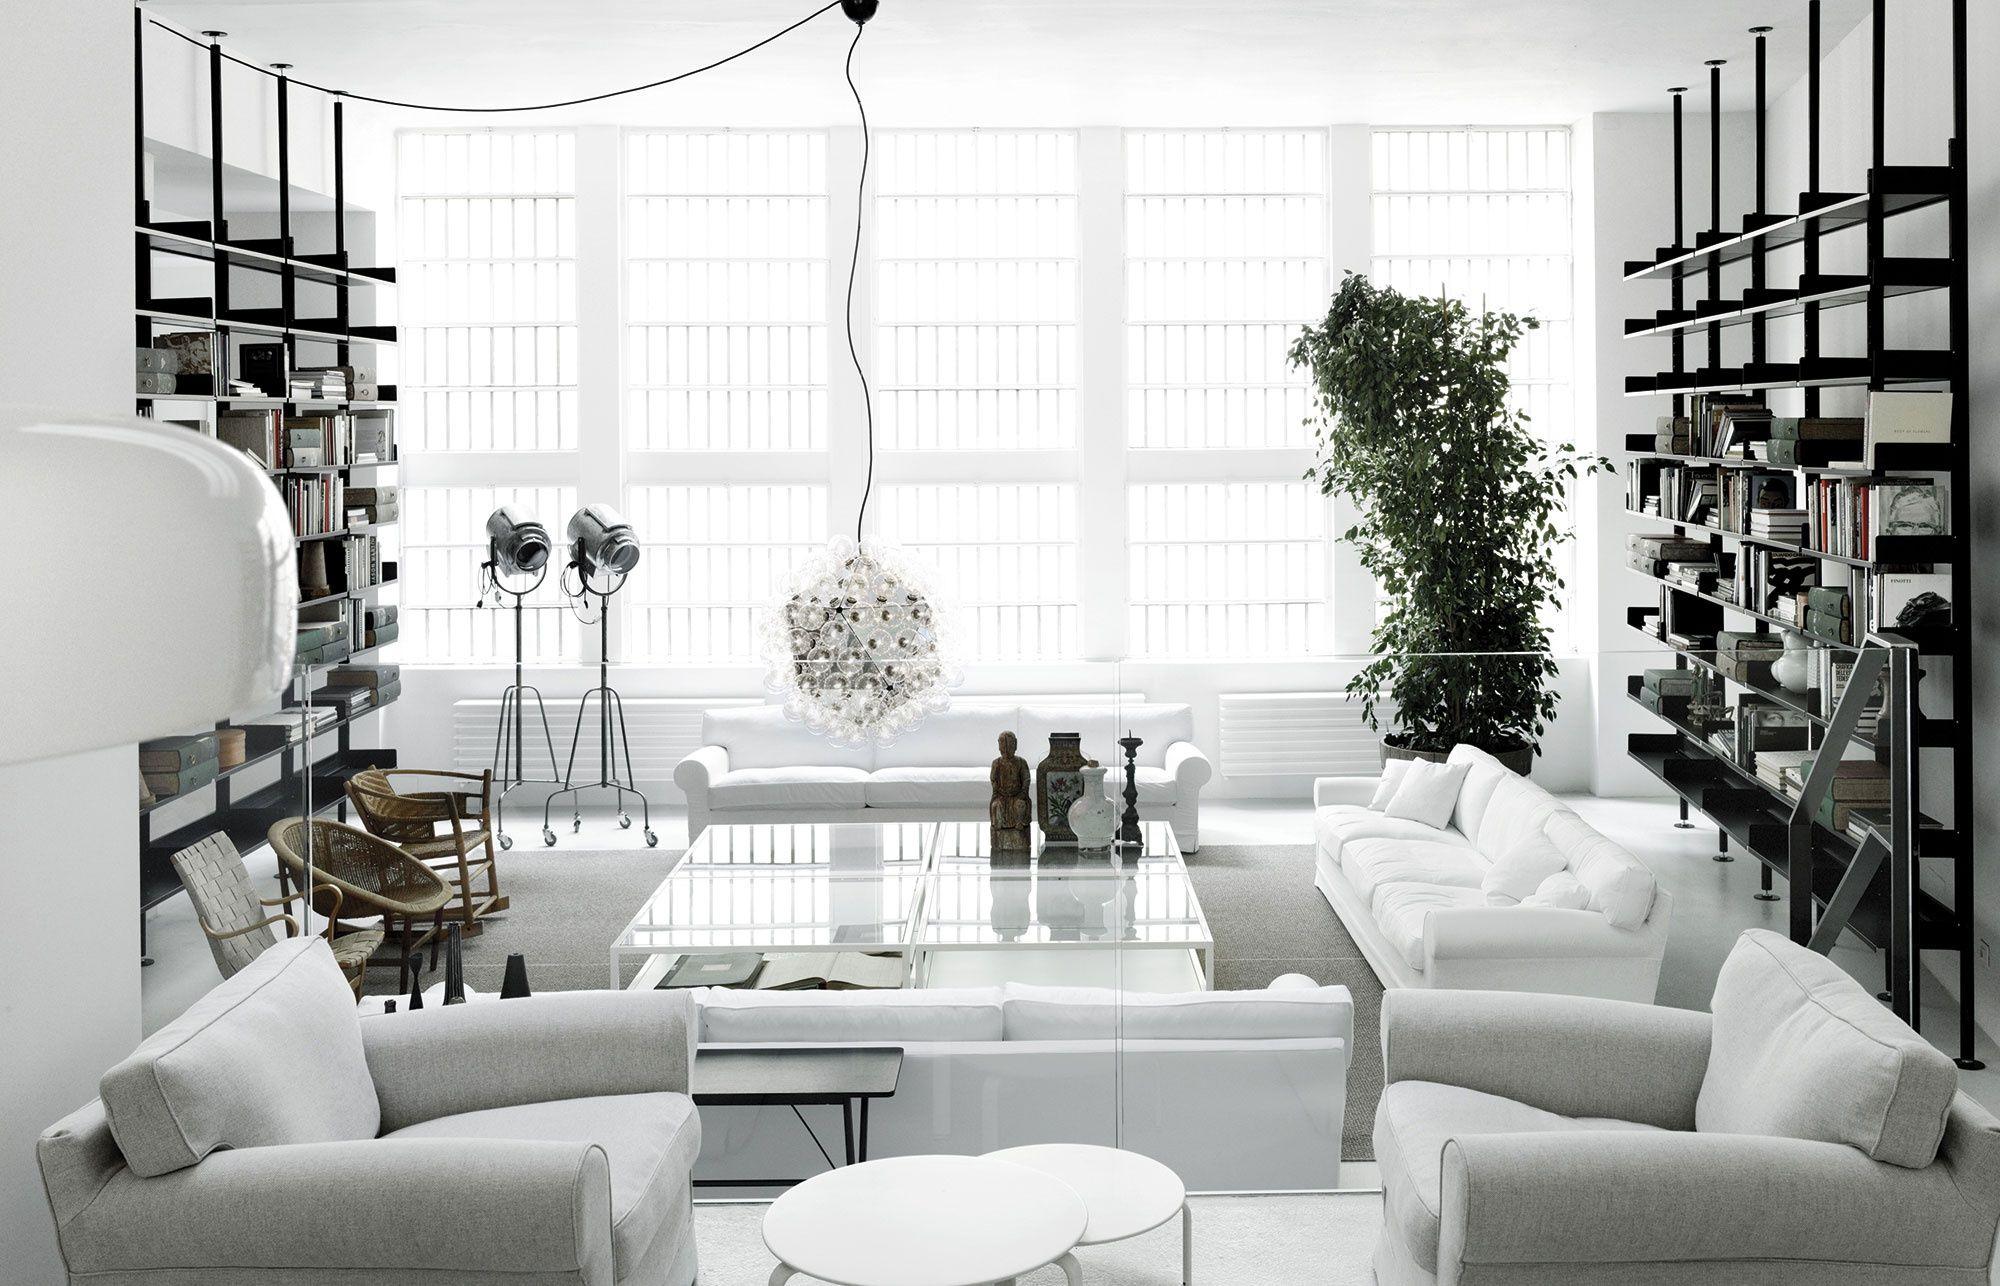 Lissoni Architettura Projects Edepadova Showroom D Cor  # Muebles Carreiro